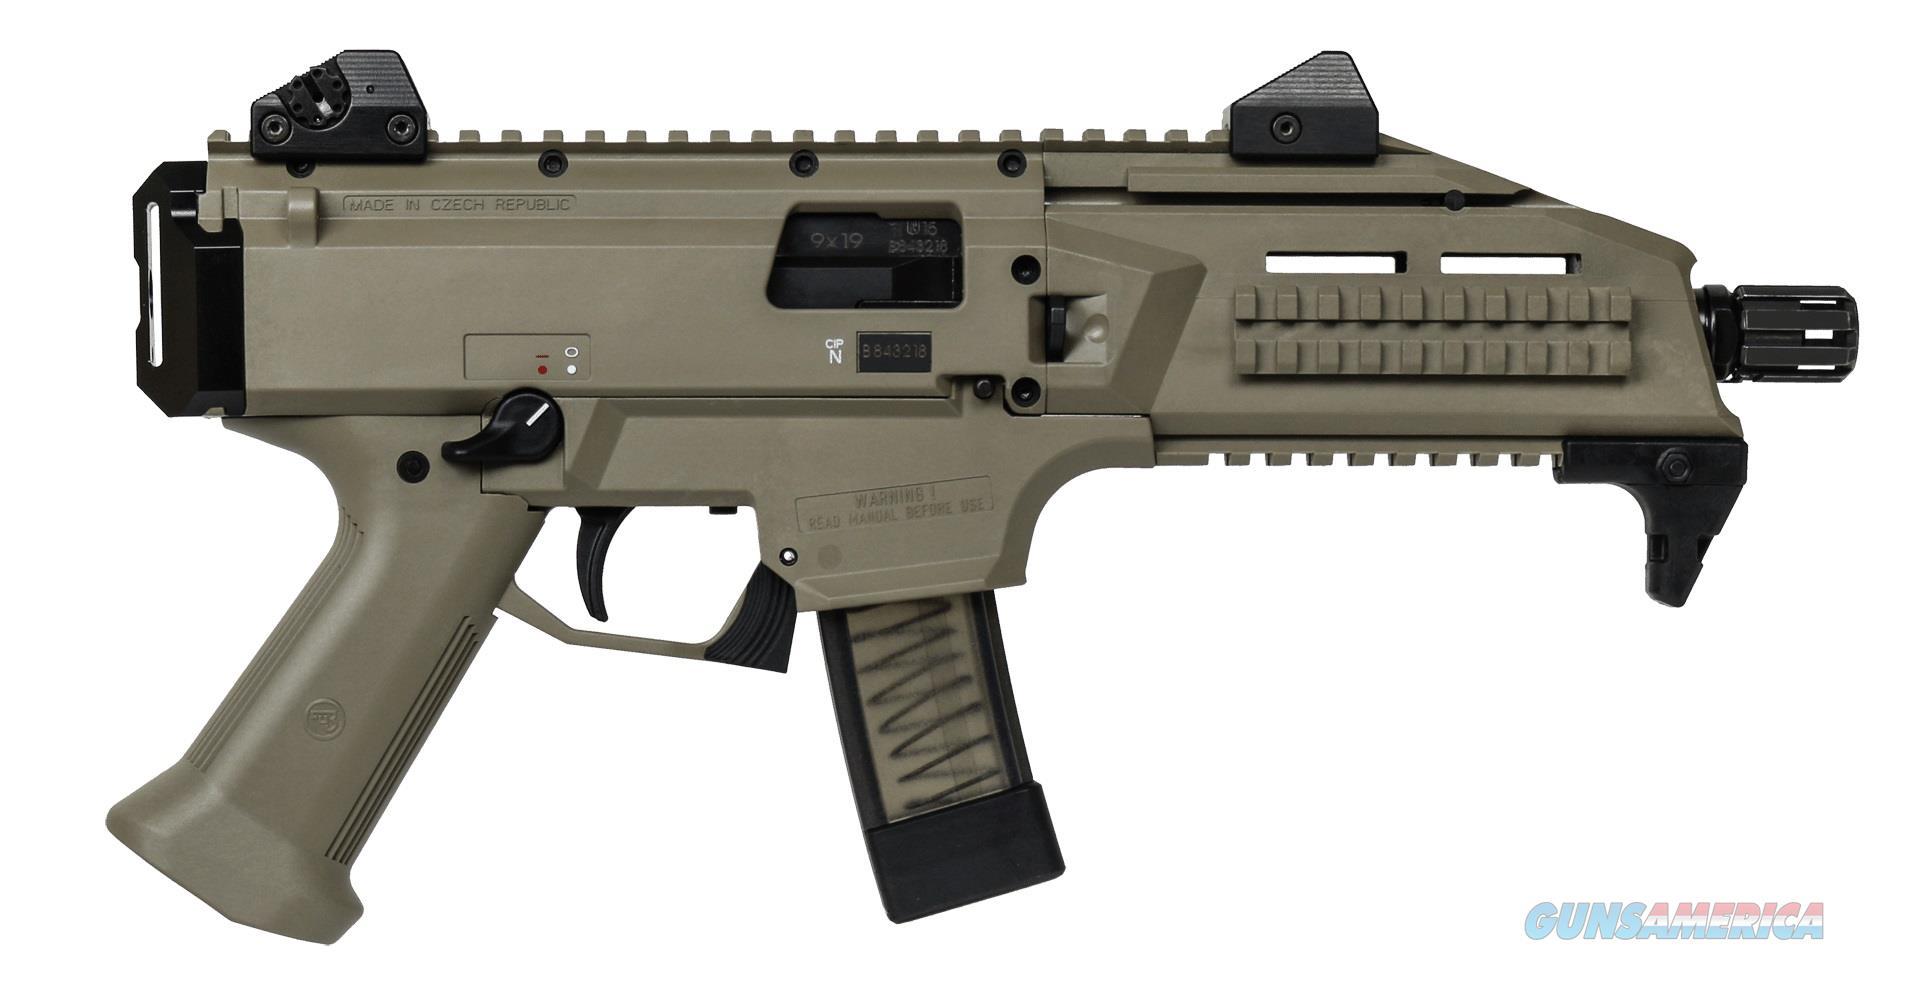 CZ-USA SCORPION EVO 3 S1 PISTOL 9MM FDE  Guns > Pistols > CZ Pistols